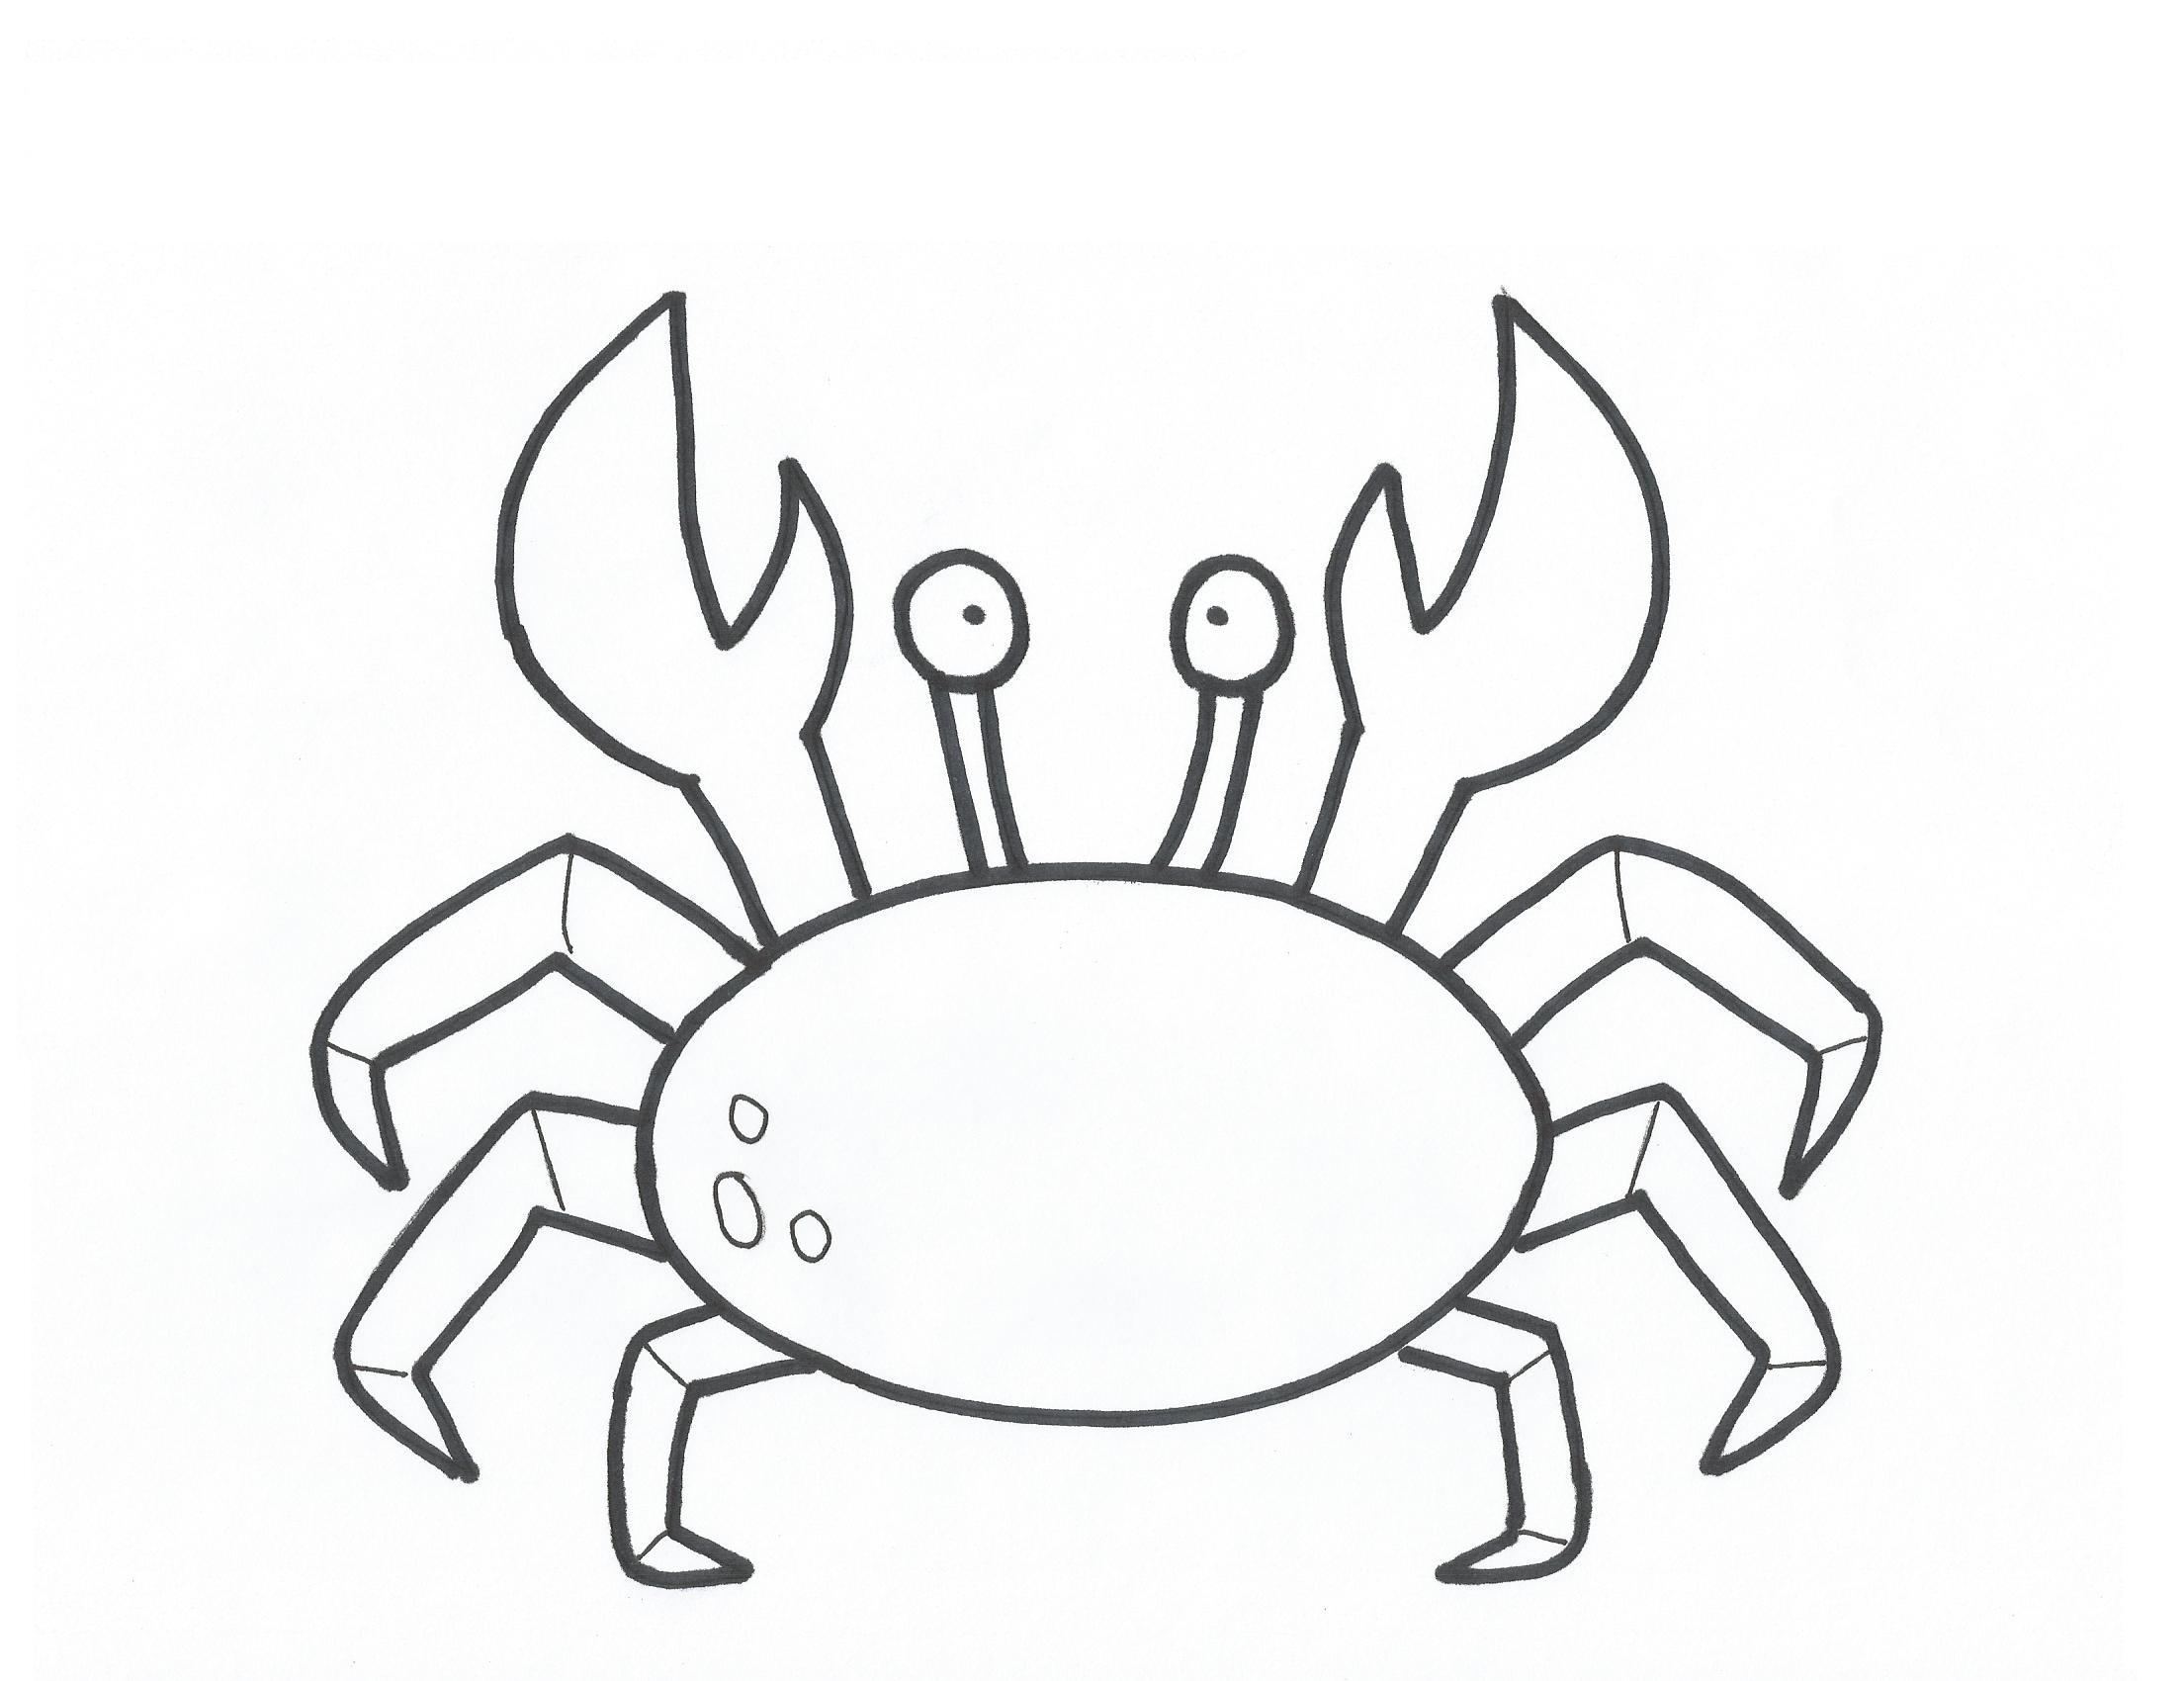 Delicious crustacean creature Crab 18 Crab coloring pages